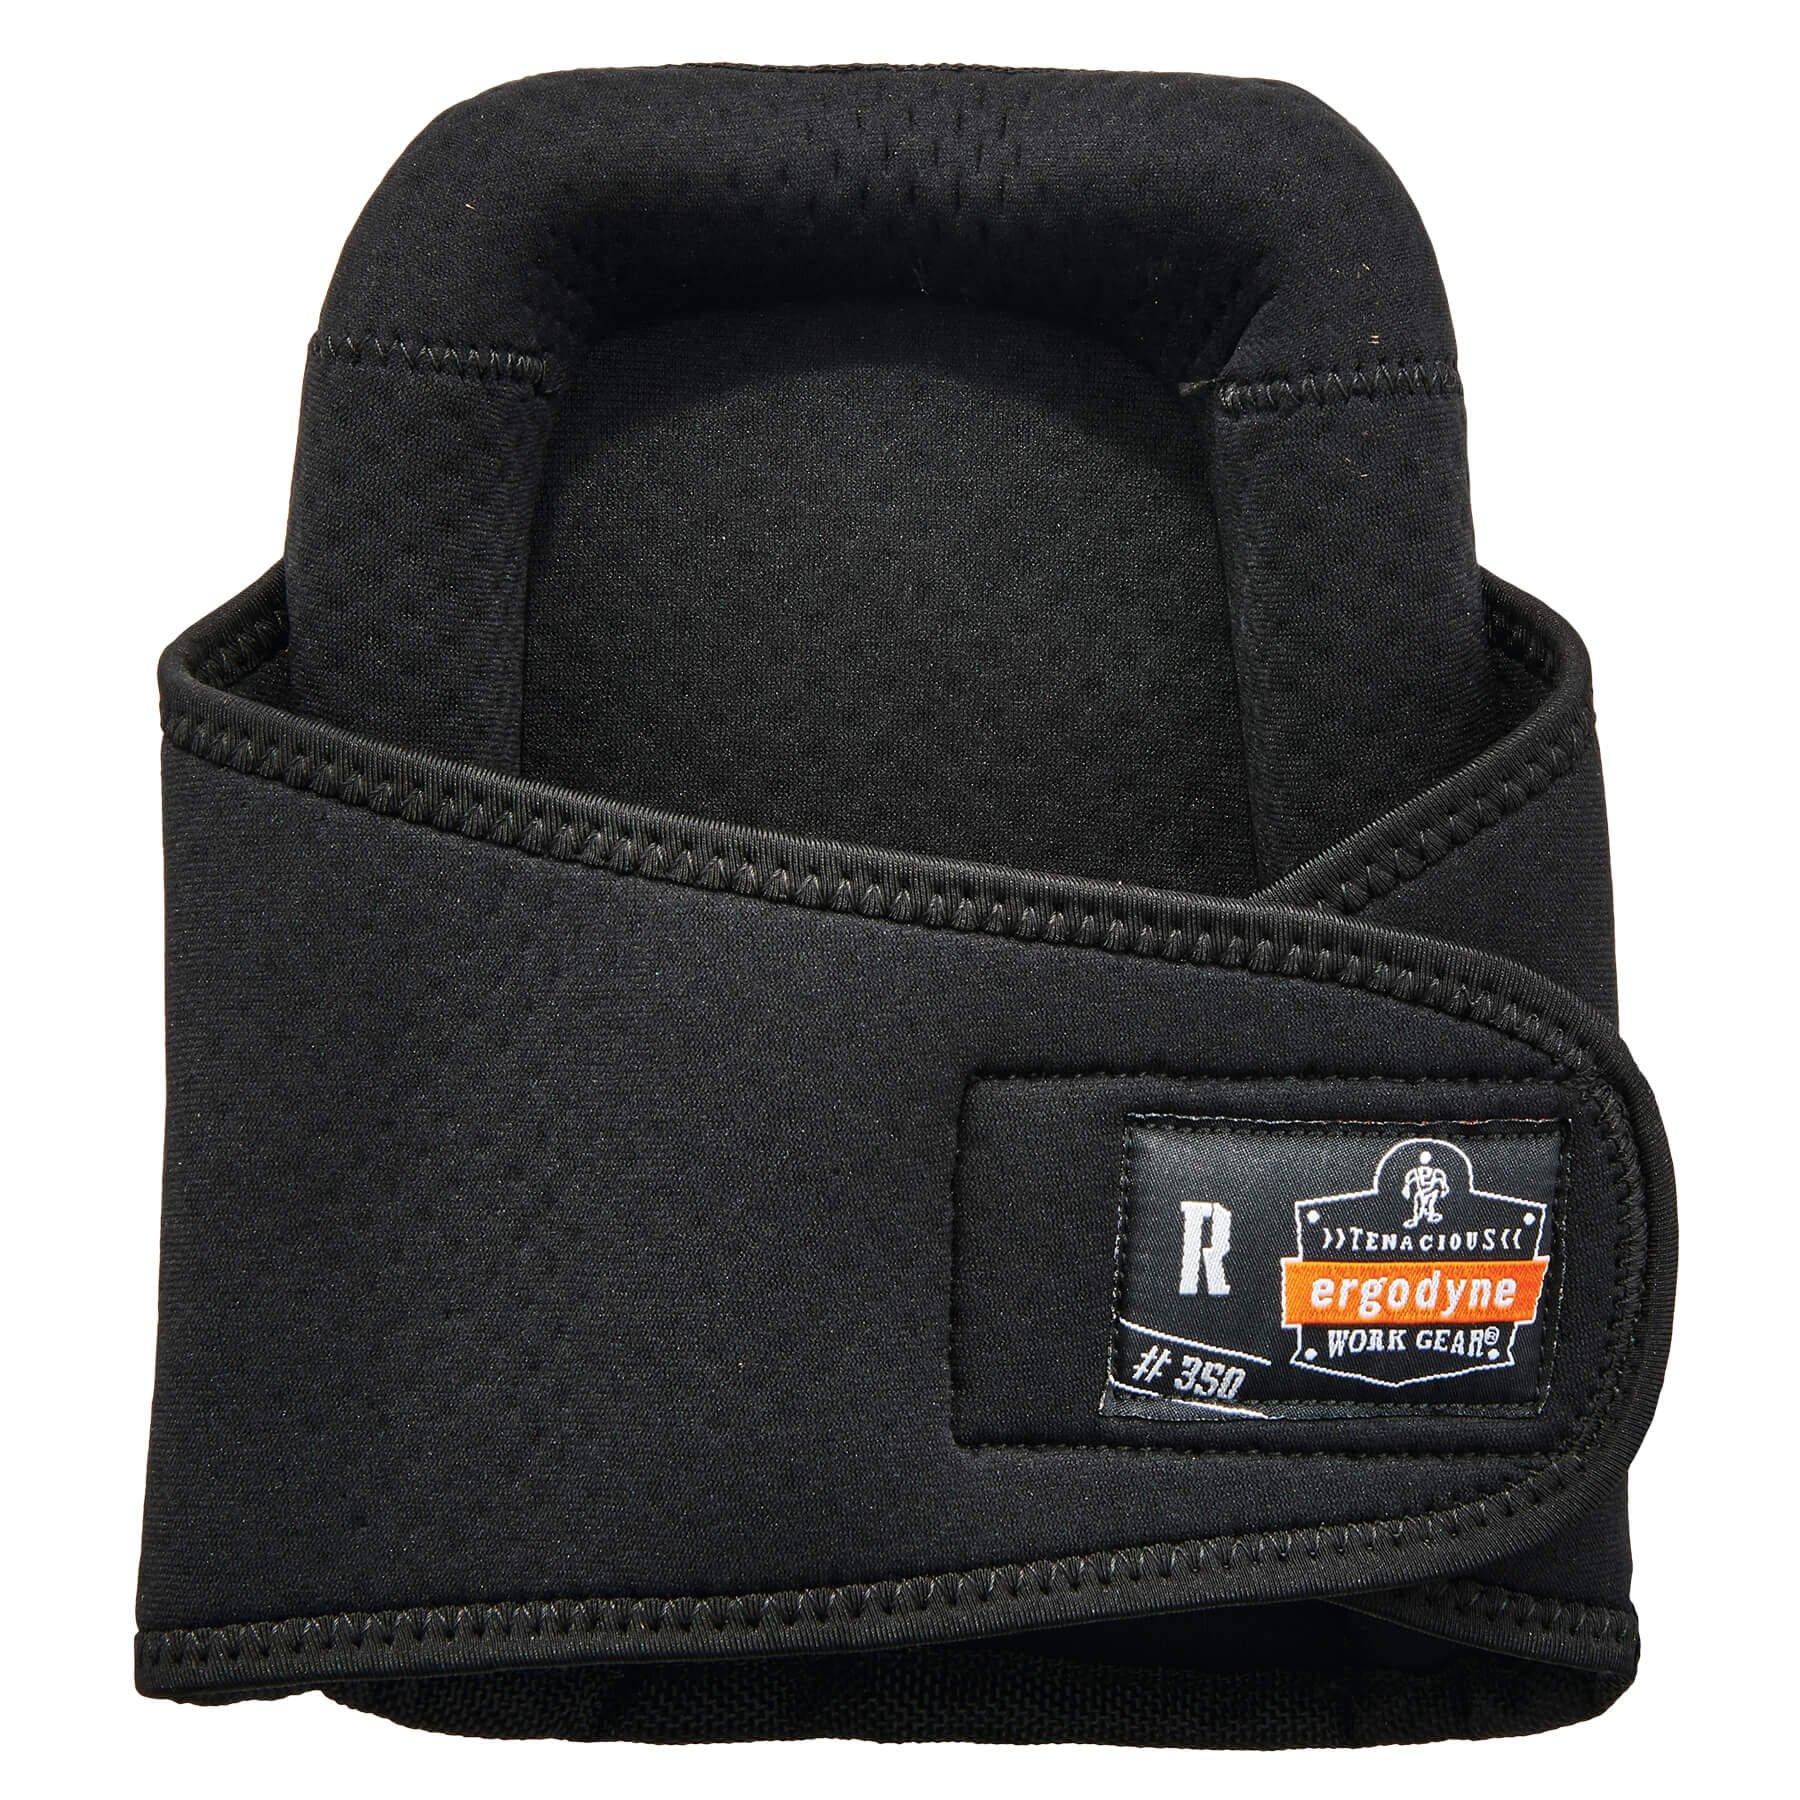 Ergodyne ProFlex 350 Protective Slip-Resistant Knee Pads, Gel Foam Padded Technology, Adjustable Straps, Black by Ergodyne (Image #2)